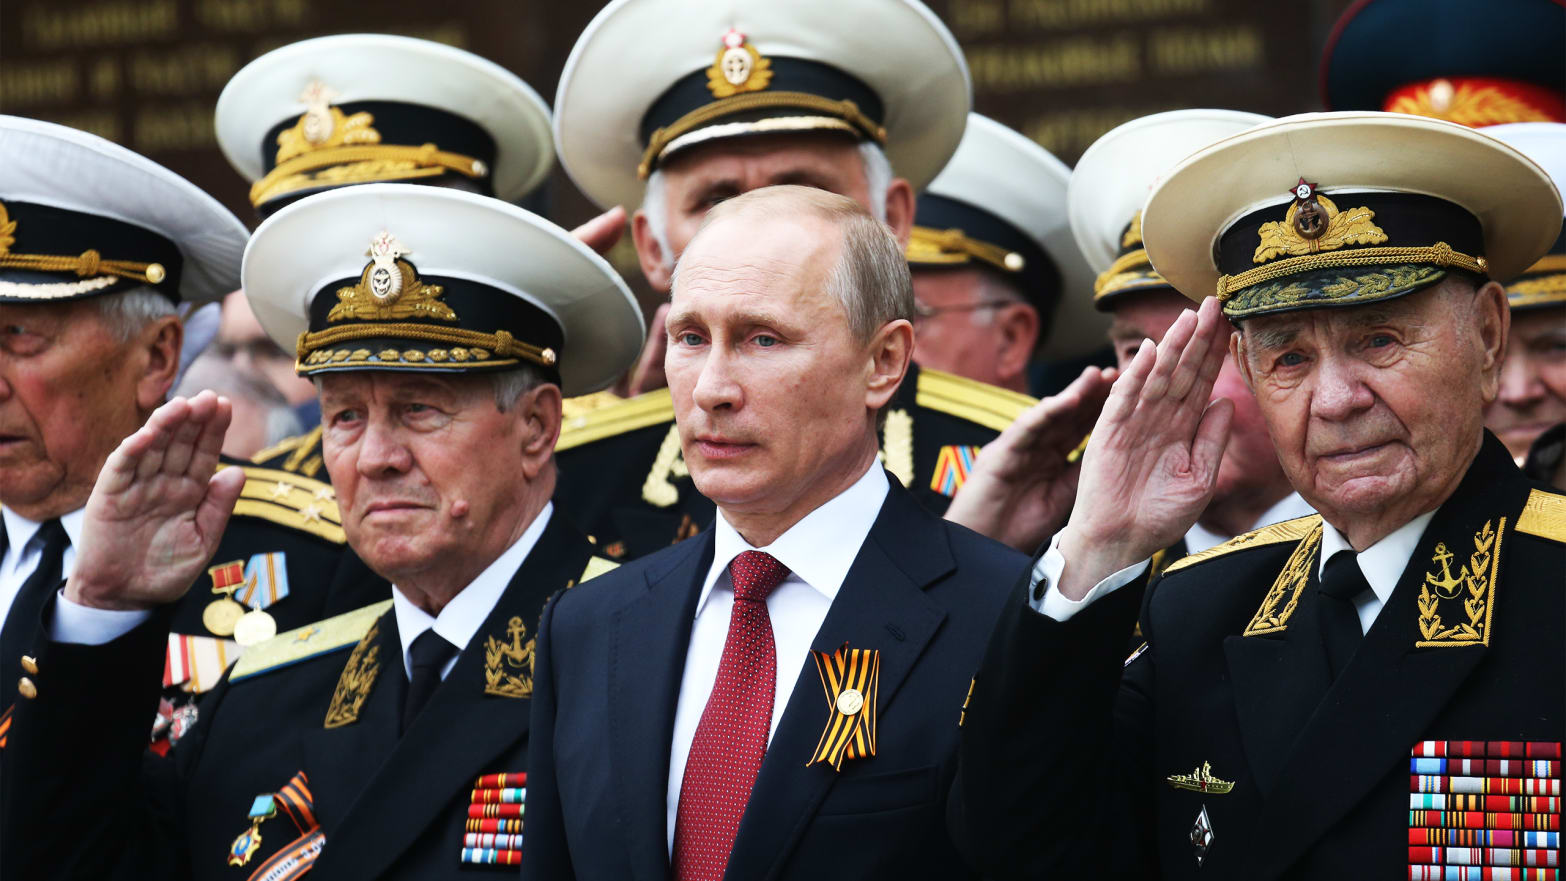 Putin's Filmmaker Speaks, Reveals Unseen Footage of Russian Leader's